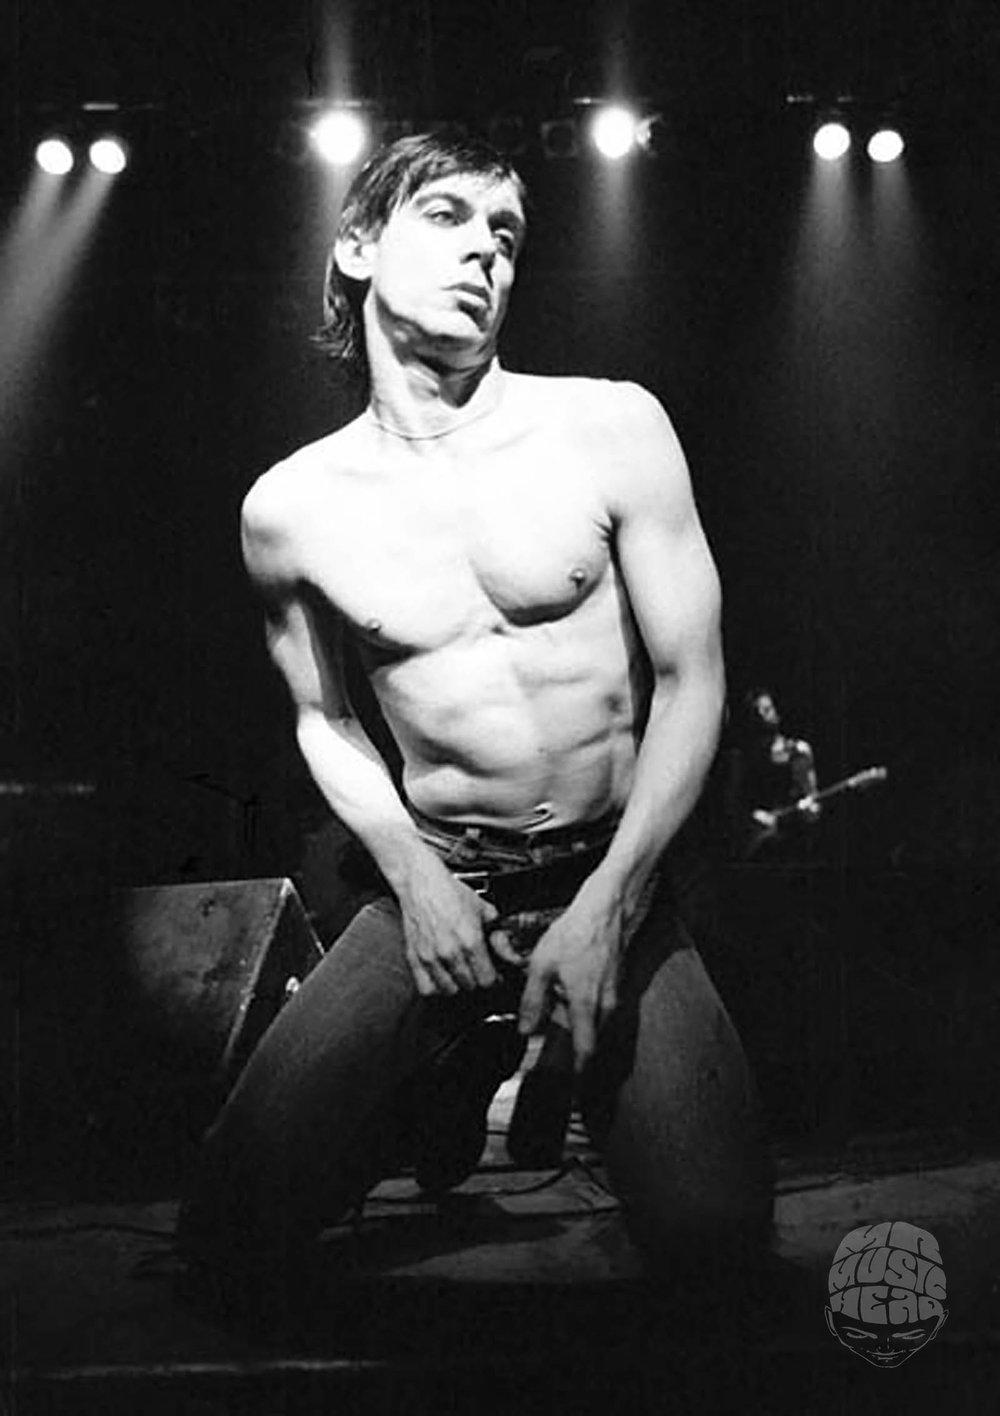 ian dickson_Iggy Pop_1977.jpg